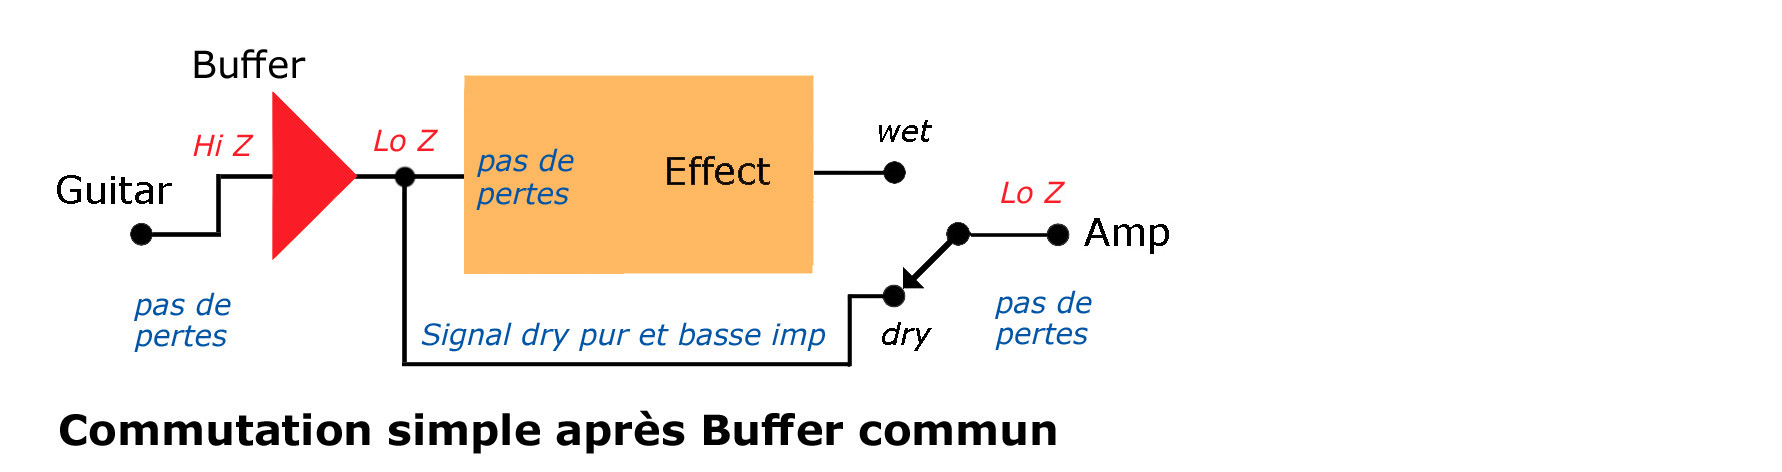 hight resolution of input buffers